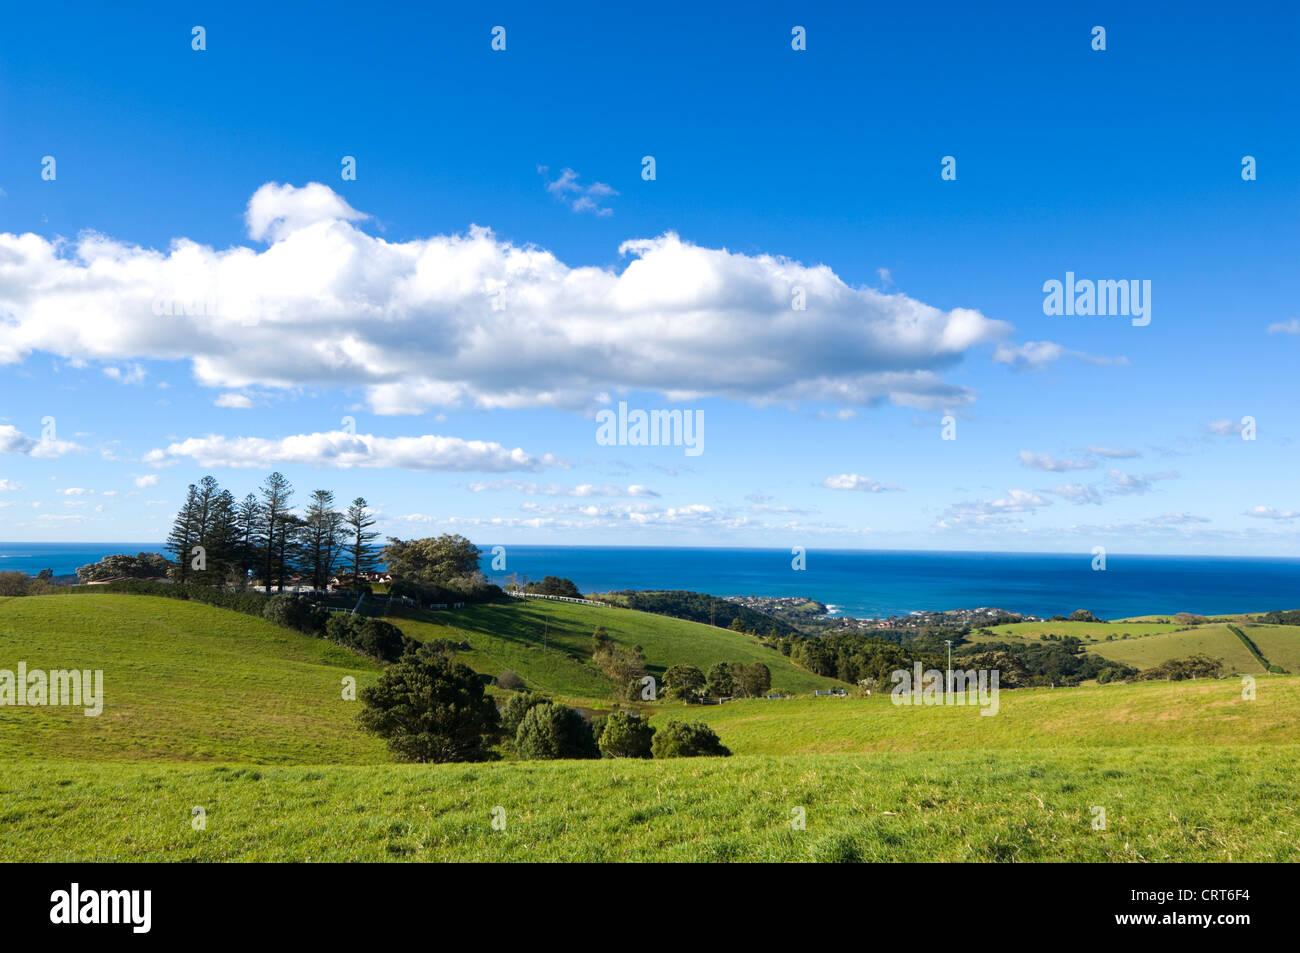 Pastureland near Kiama, New South Wales, Australia - Stock Image